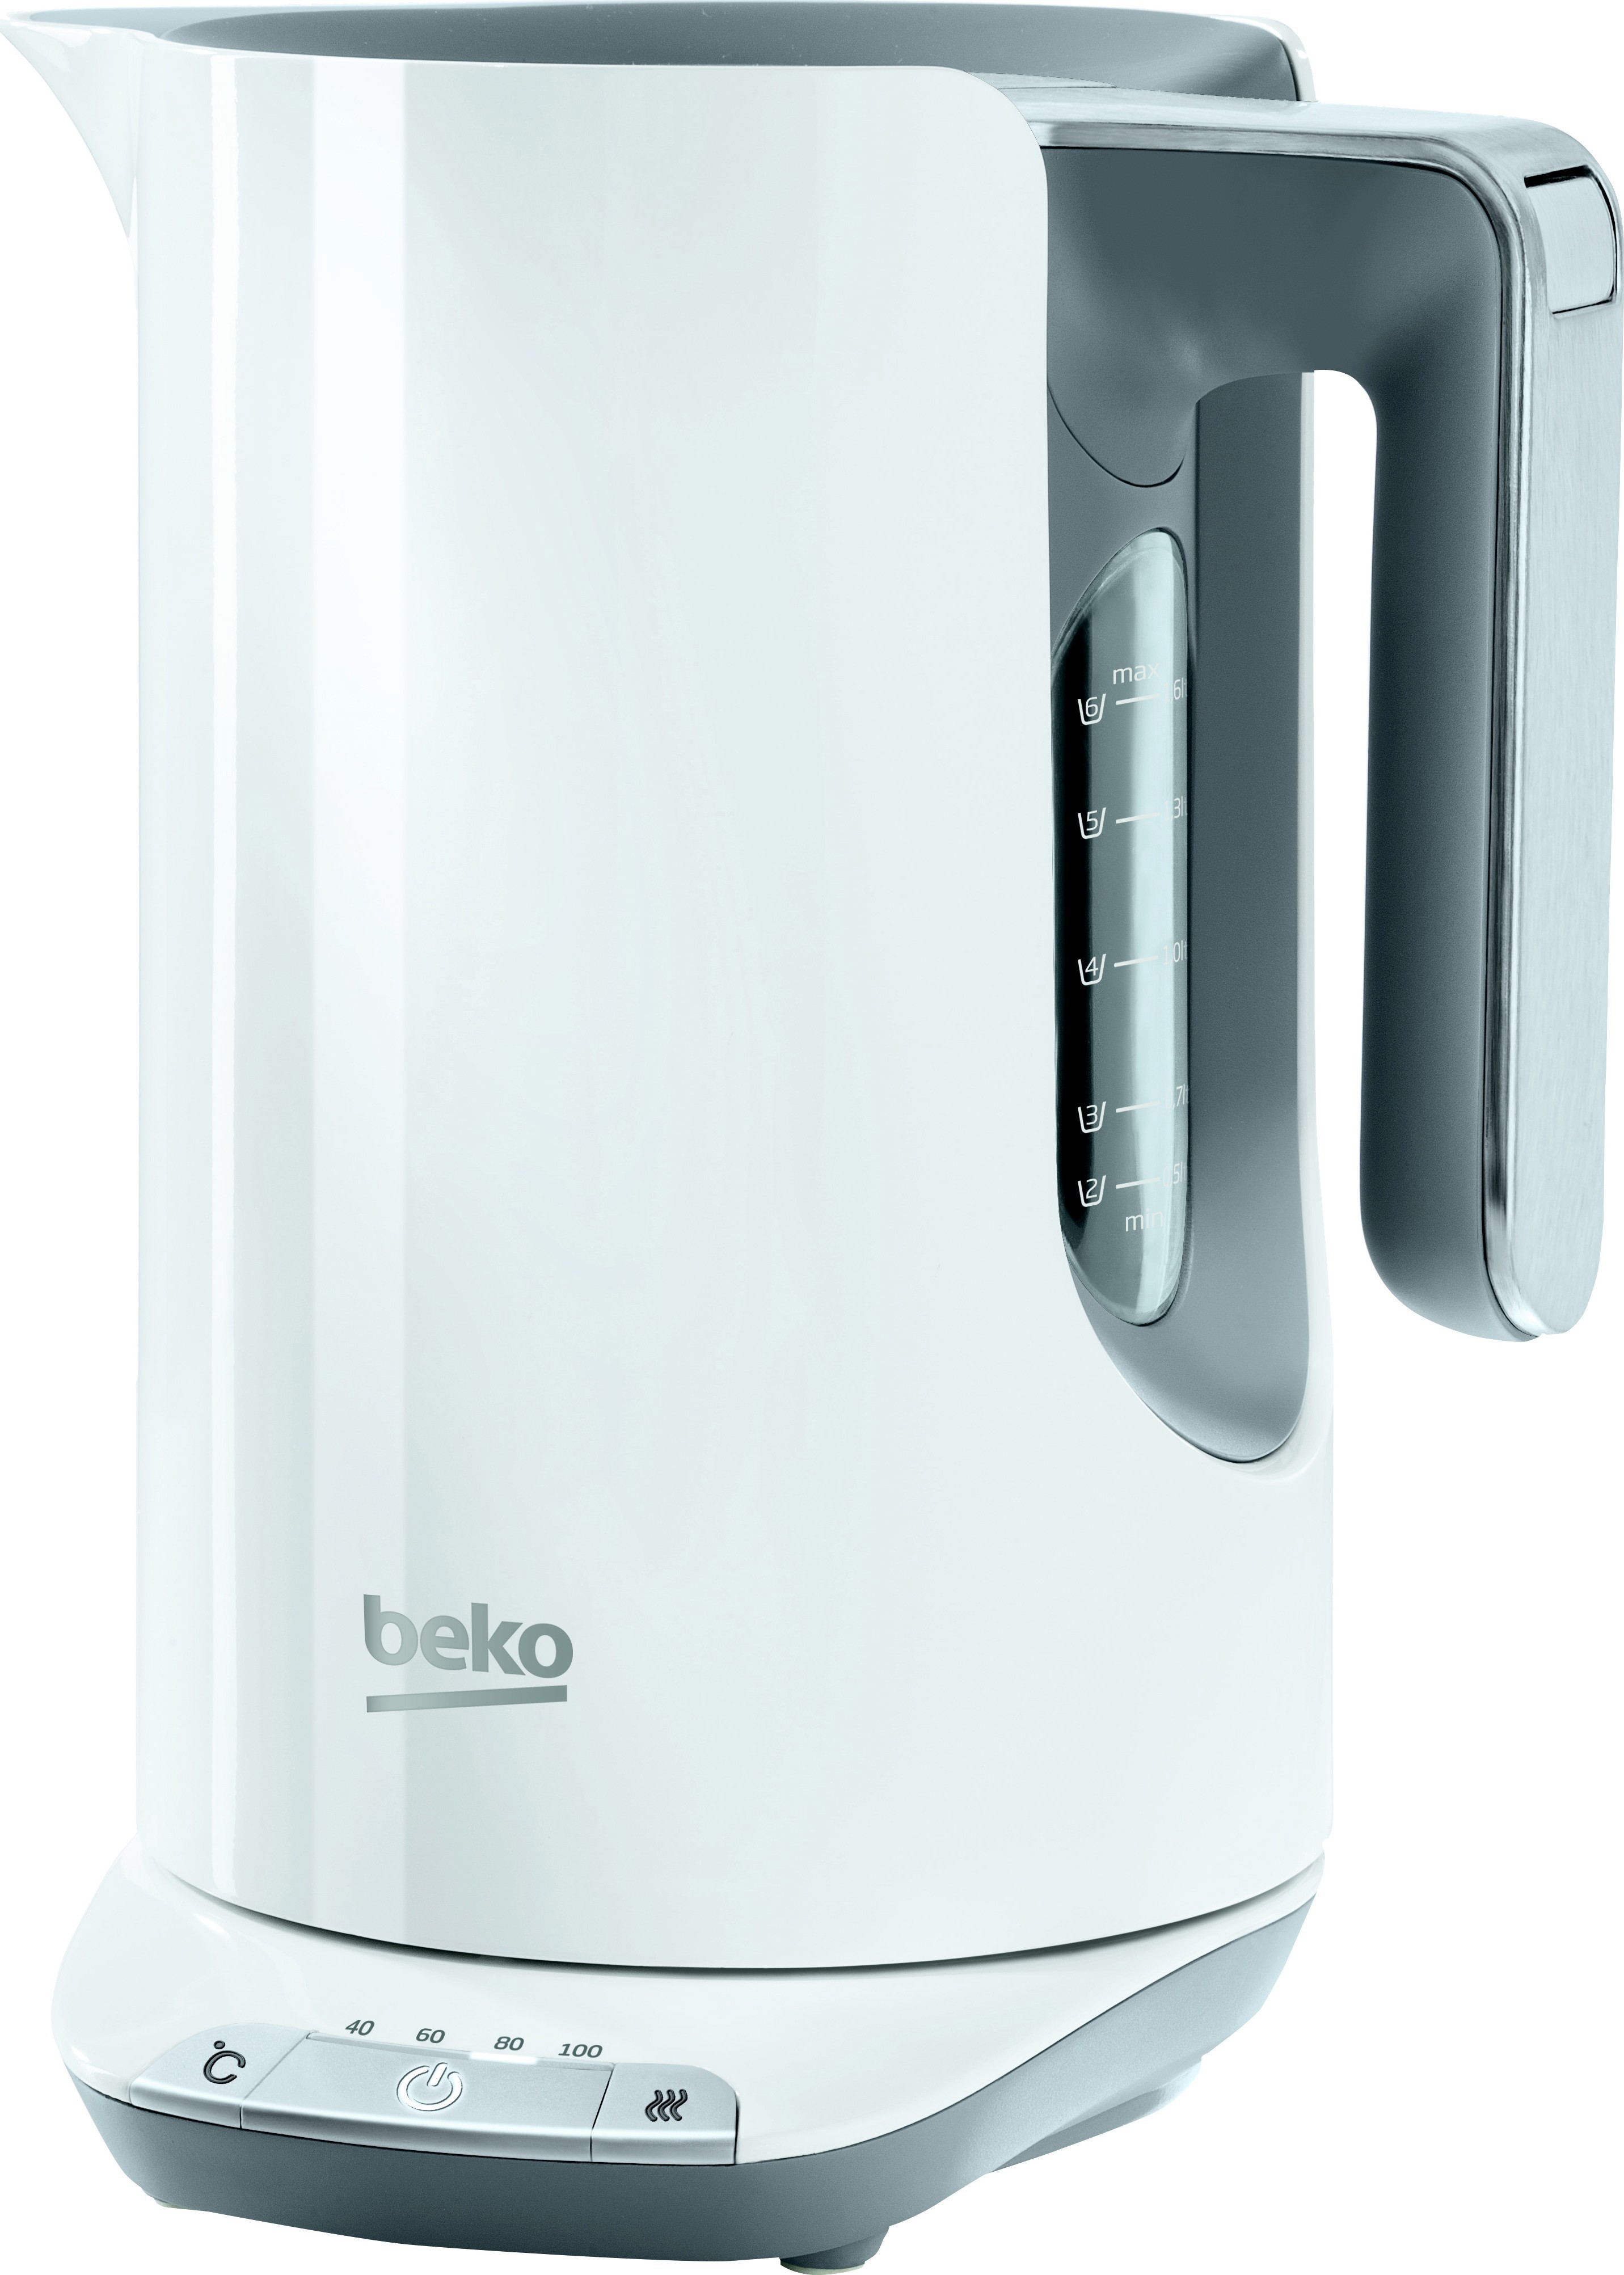 Beko WKD 6246W